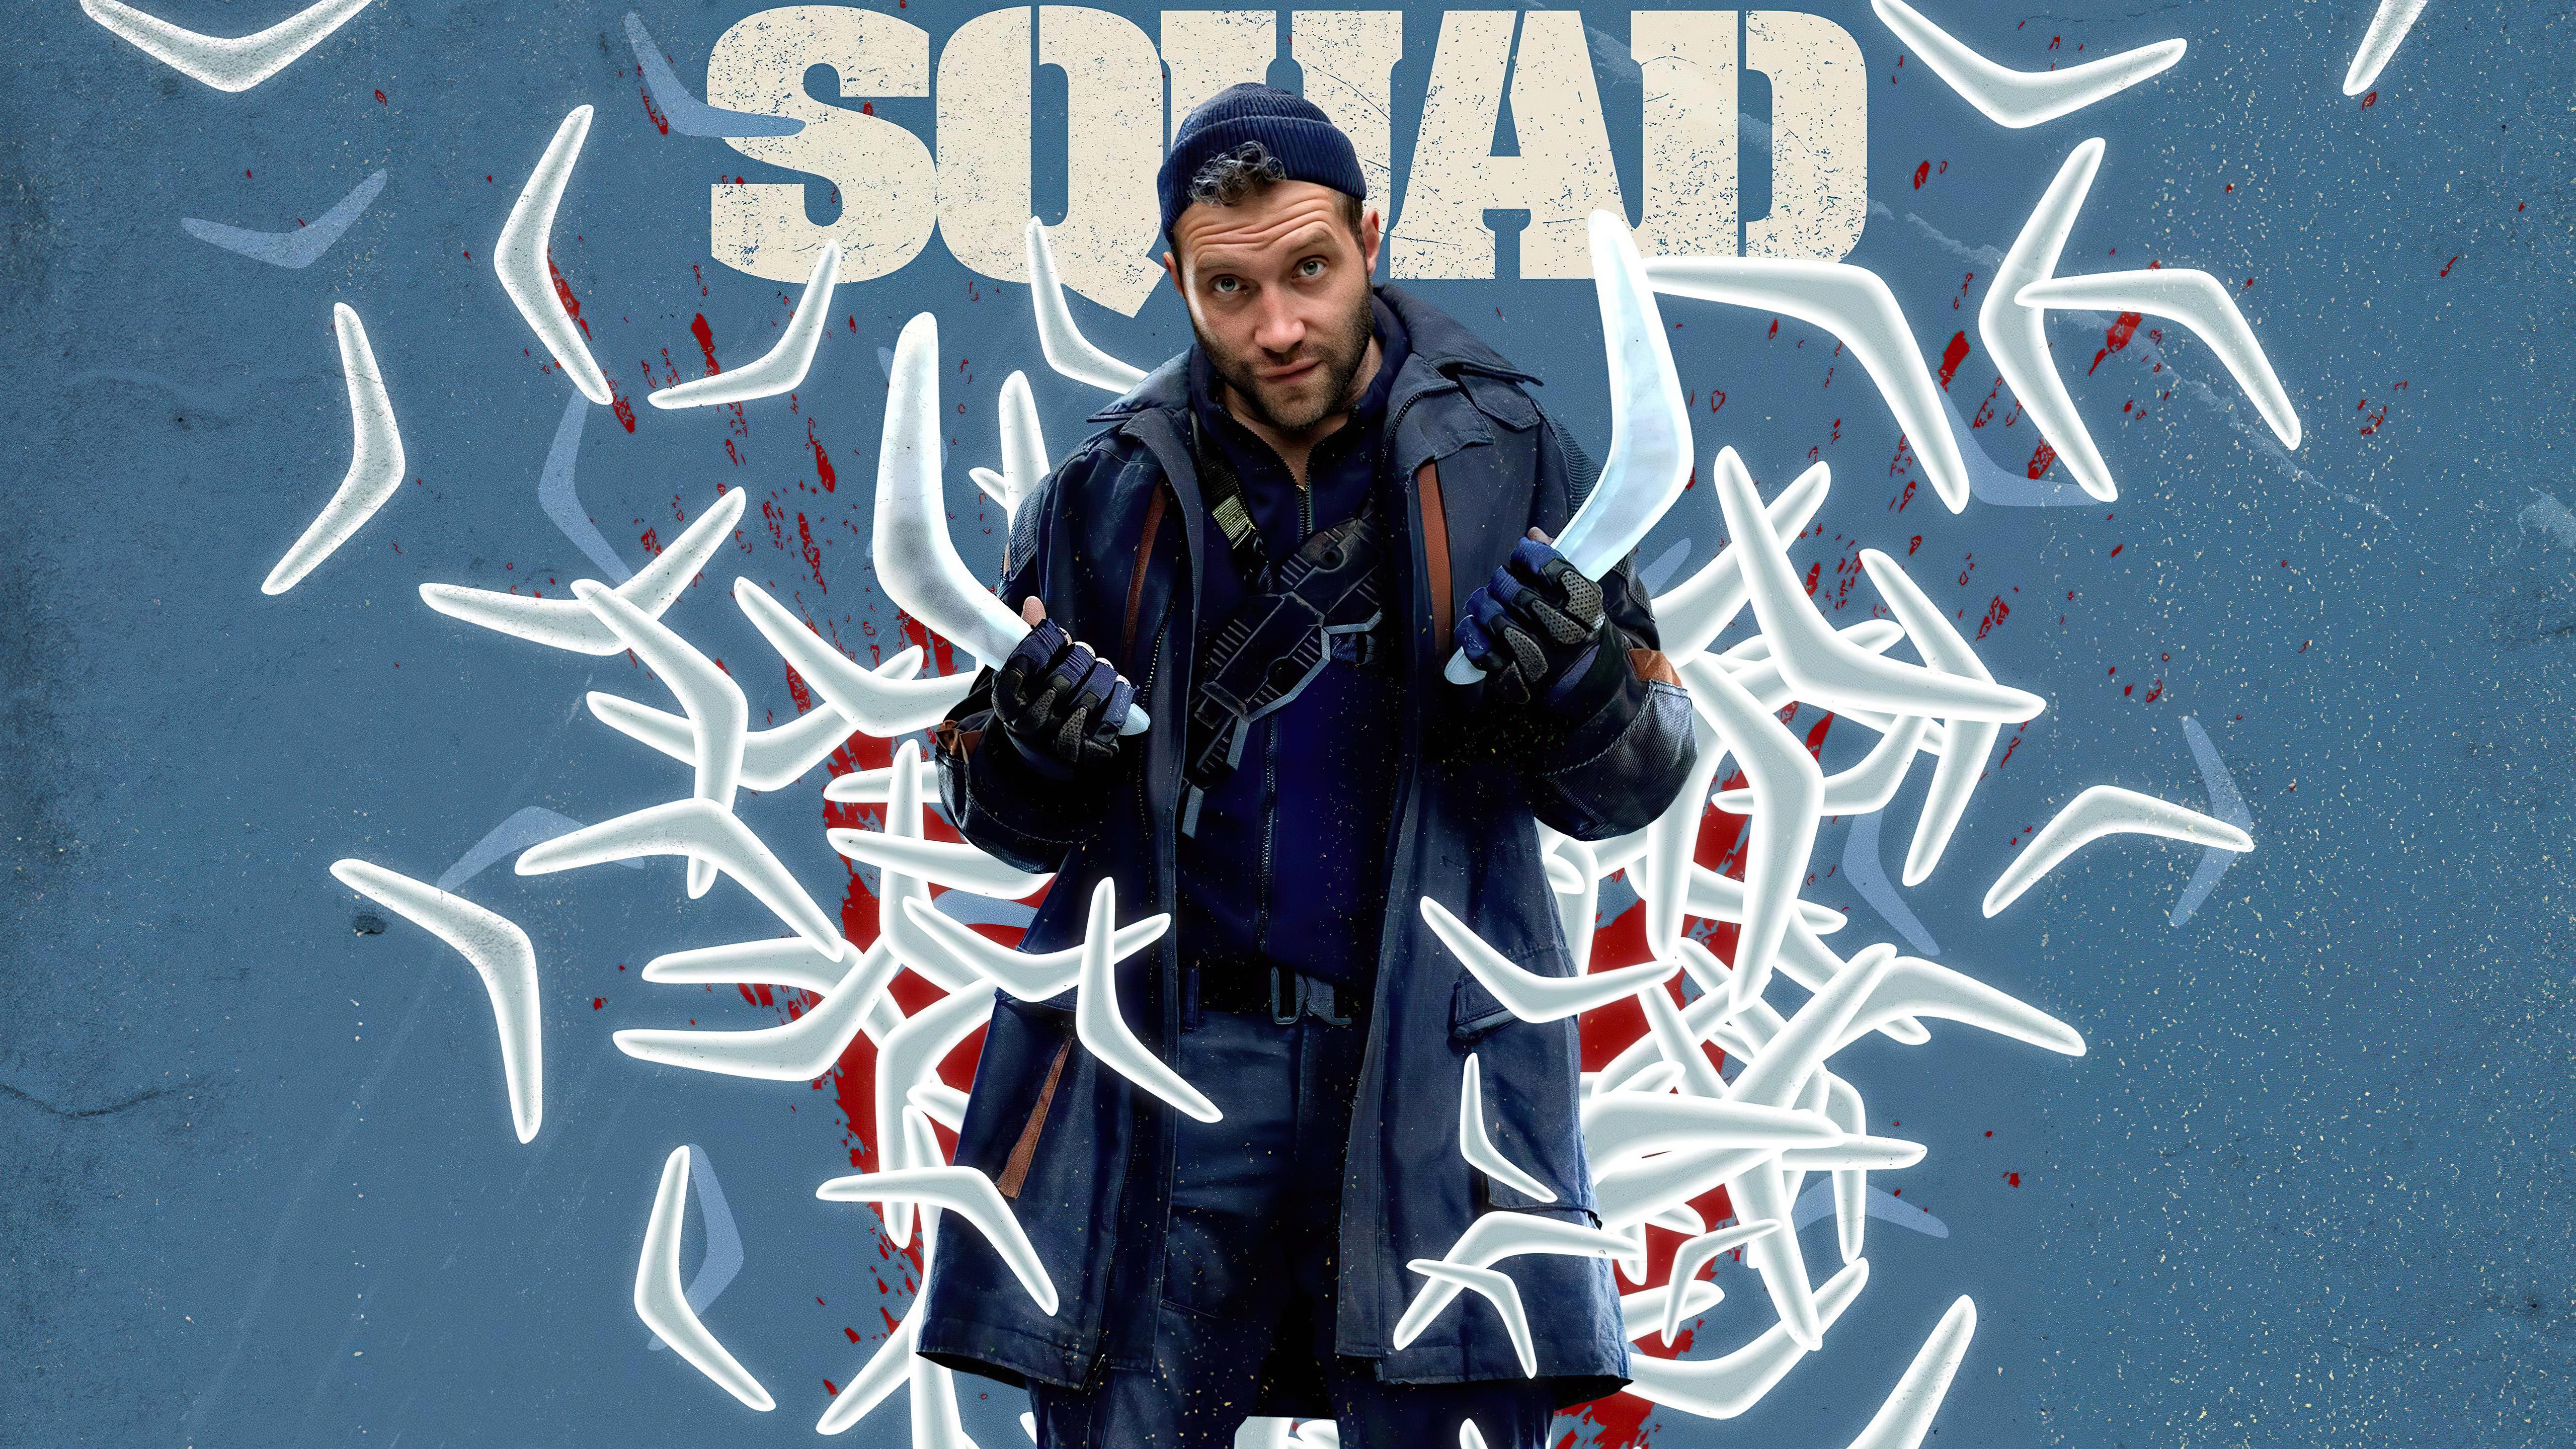 captain boomerang the suicide squad 4k 1618167076 - Captain Boomerang The Suicide Squad 4k - Captain Boomerang The Suicide Squad 4k wallpapers